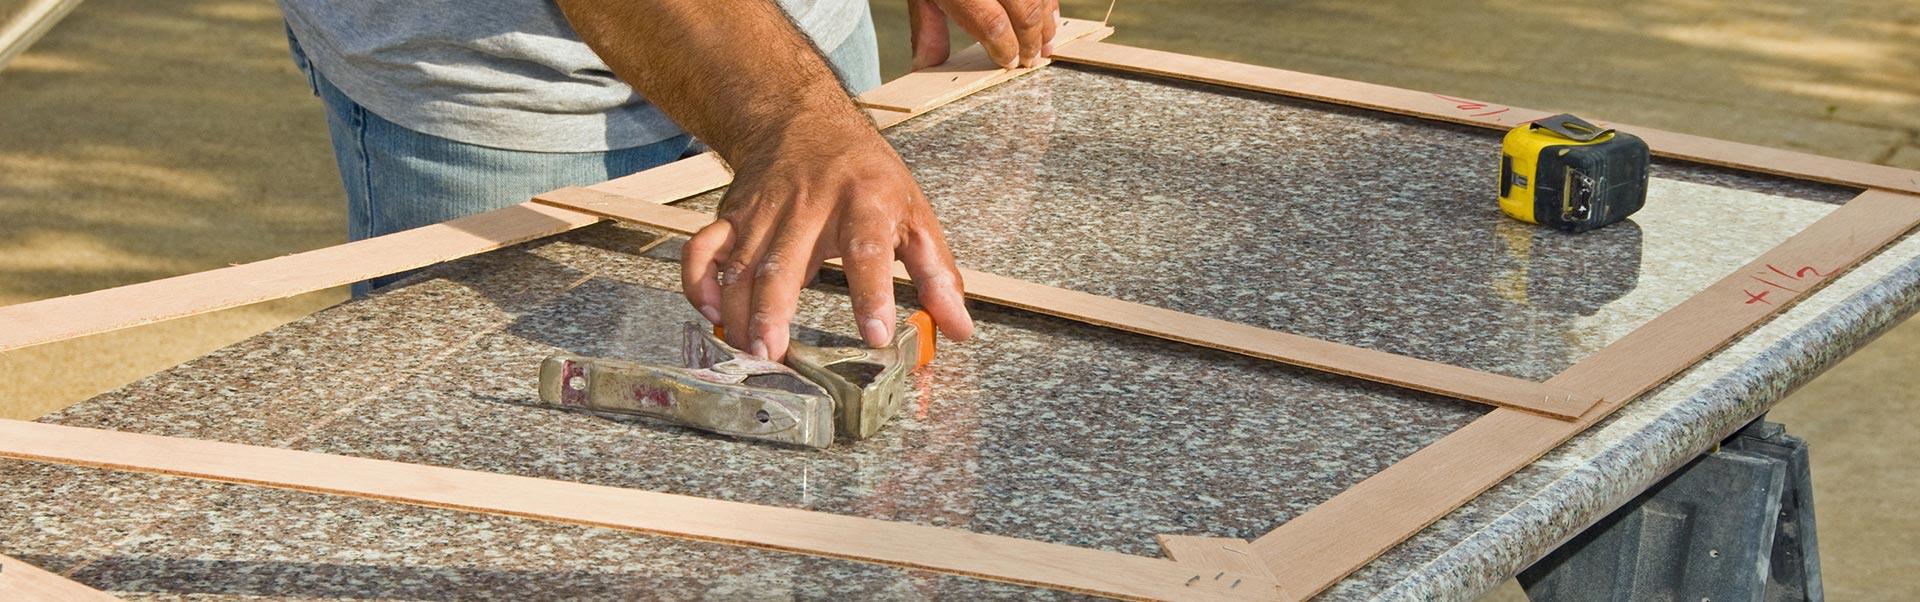 Granite Countertops In Toledo Oh